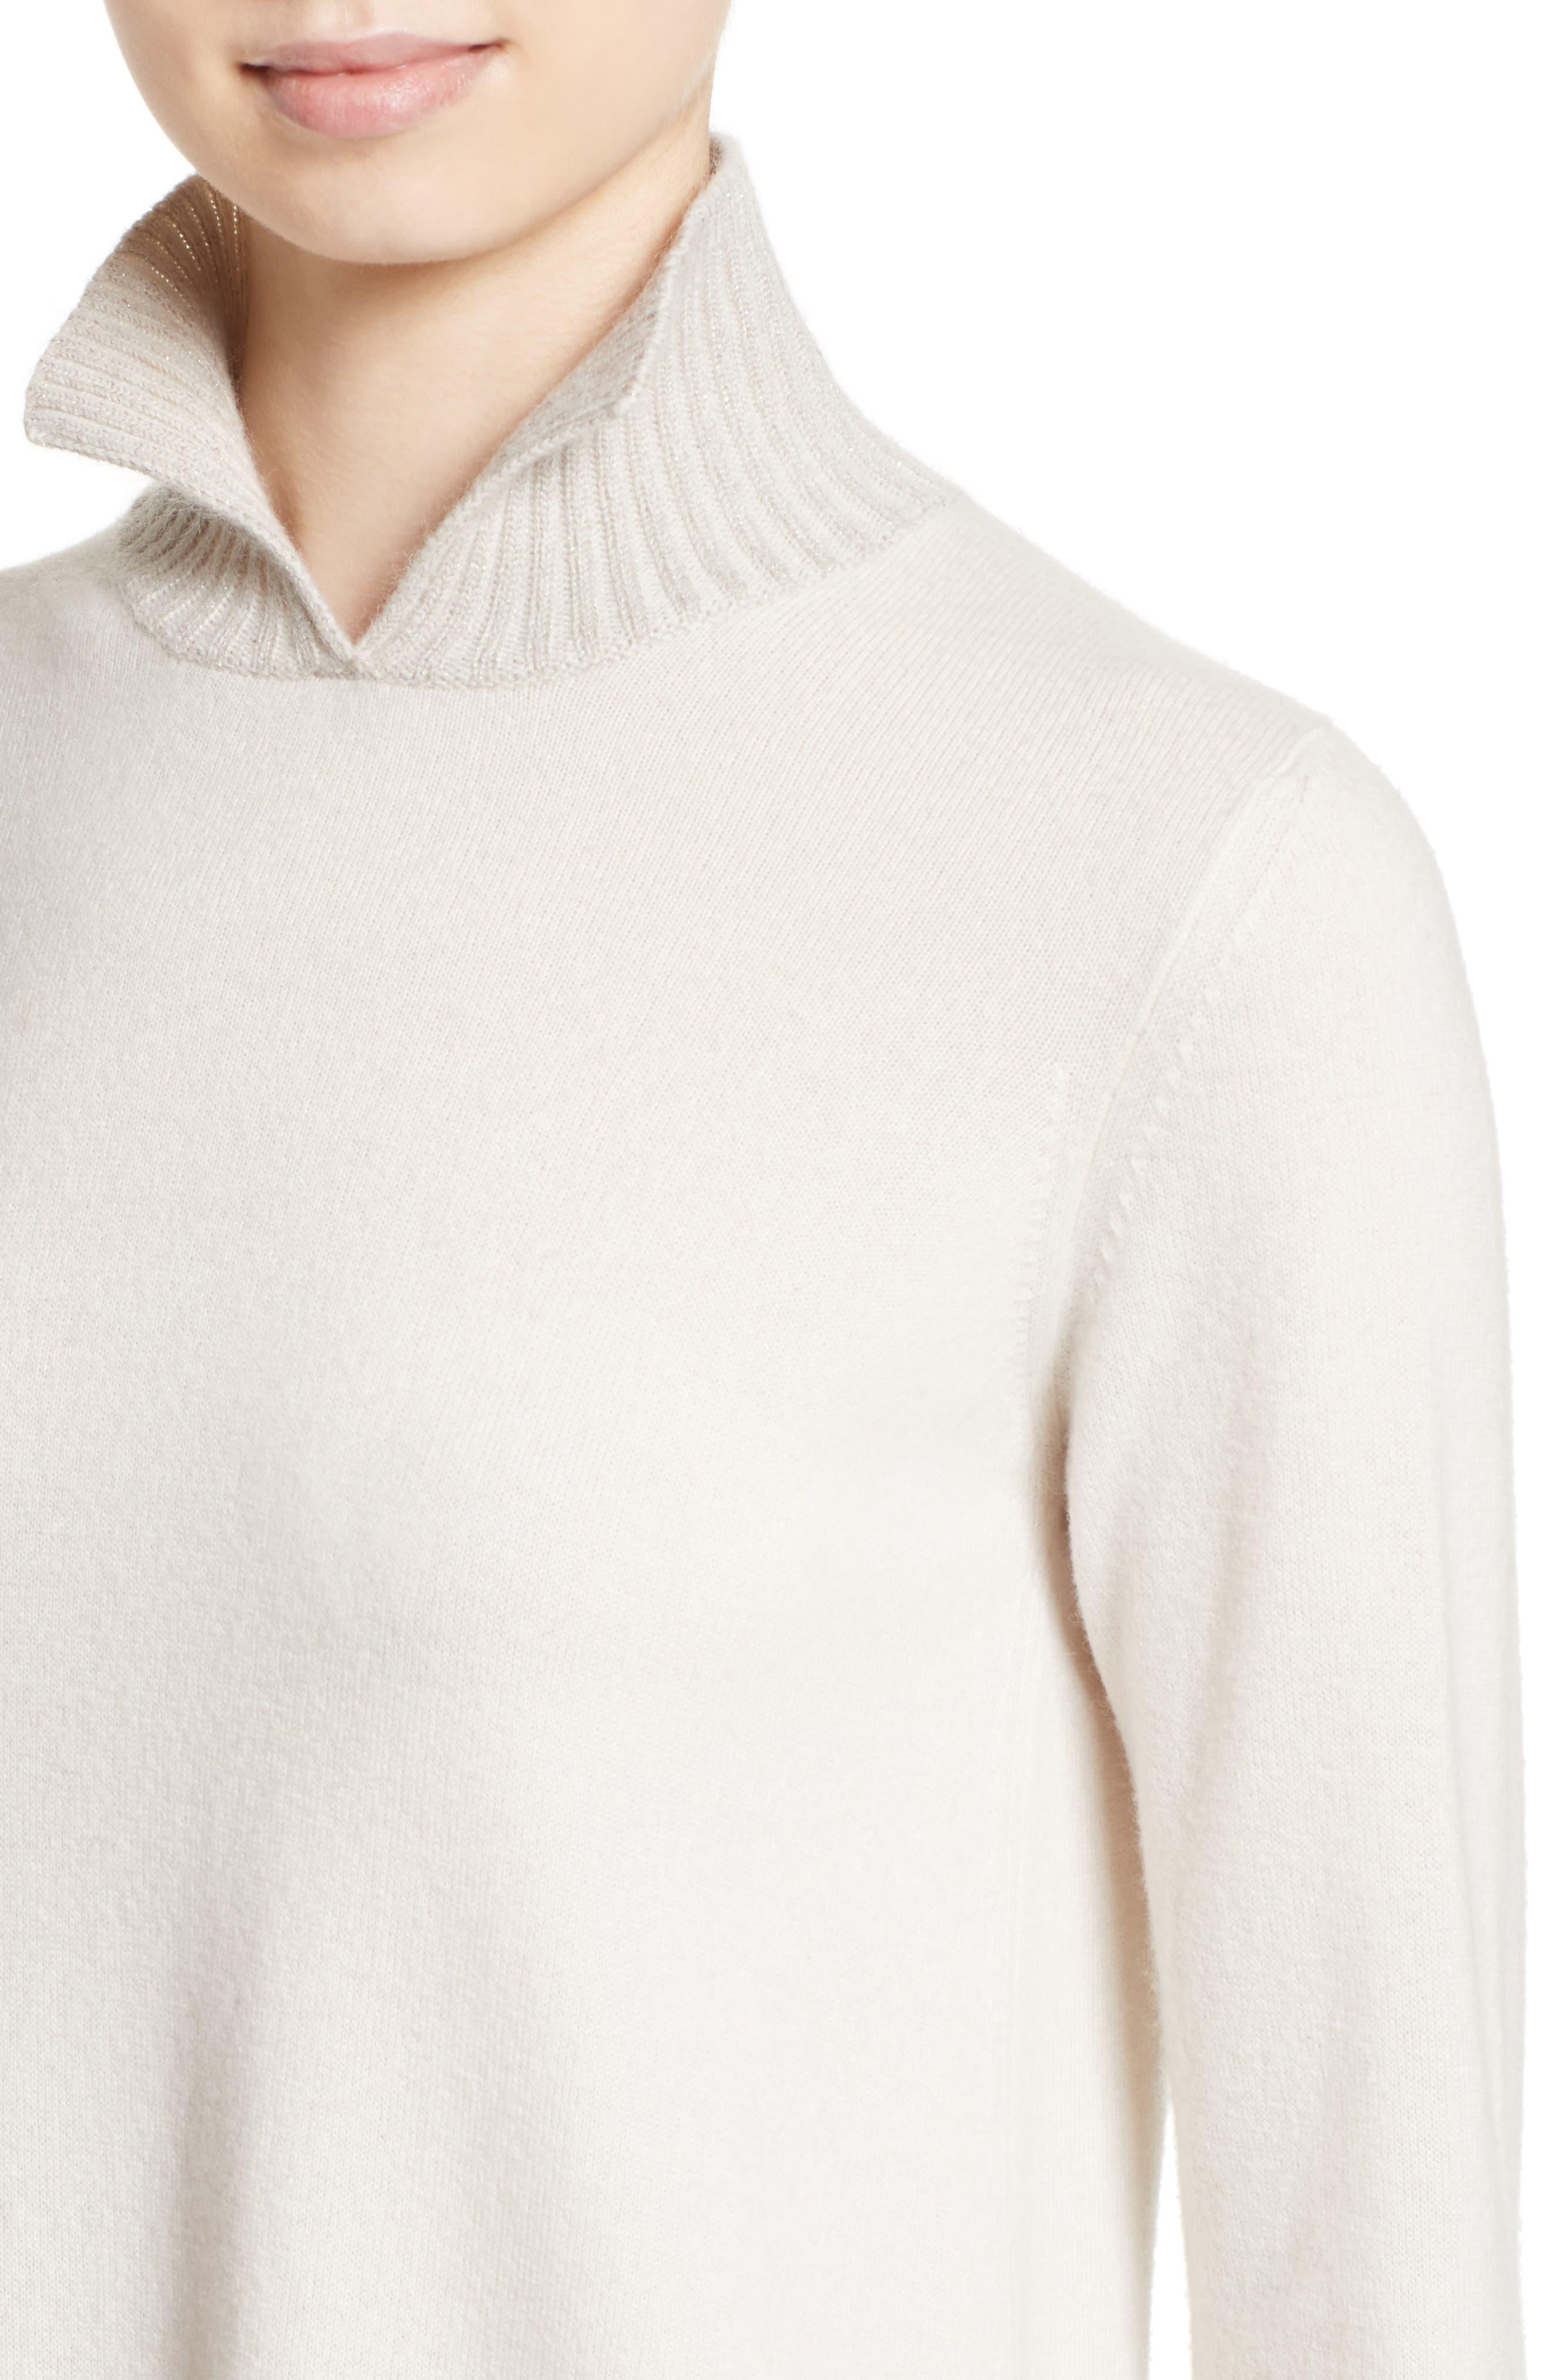 Wool, Silk & Cashmere Knit Dress,                             Alternate thumbnail 4, color,                             101